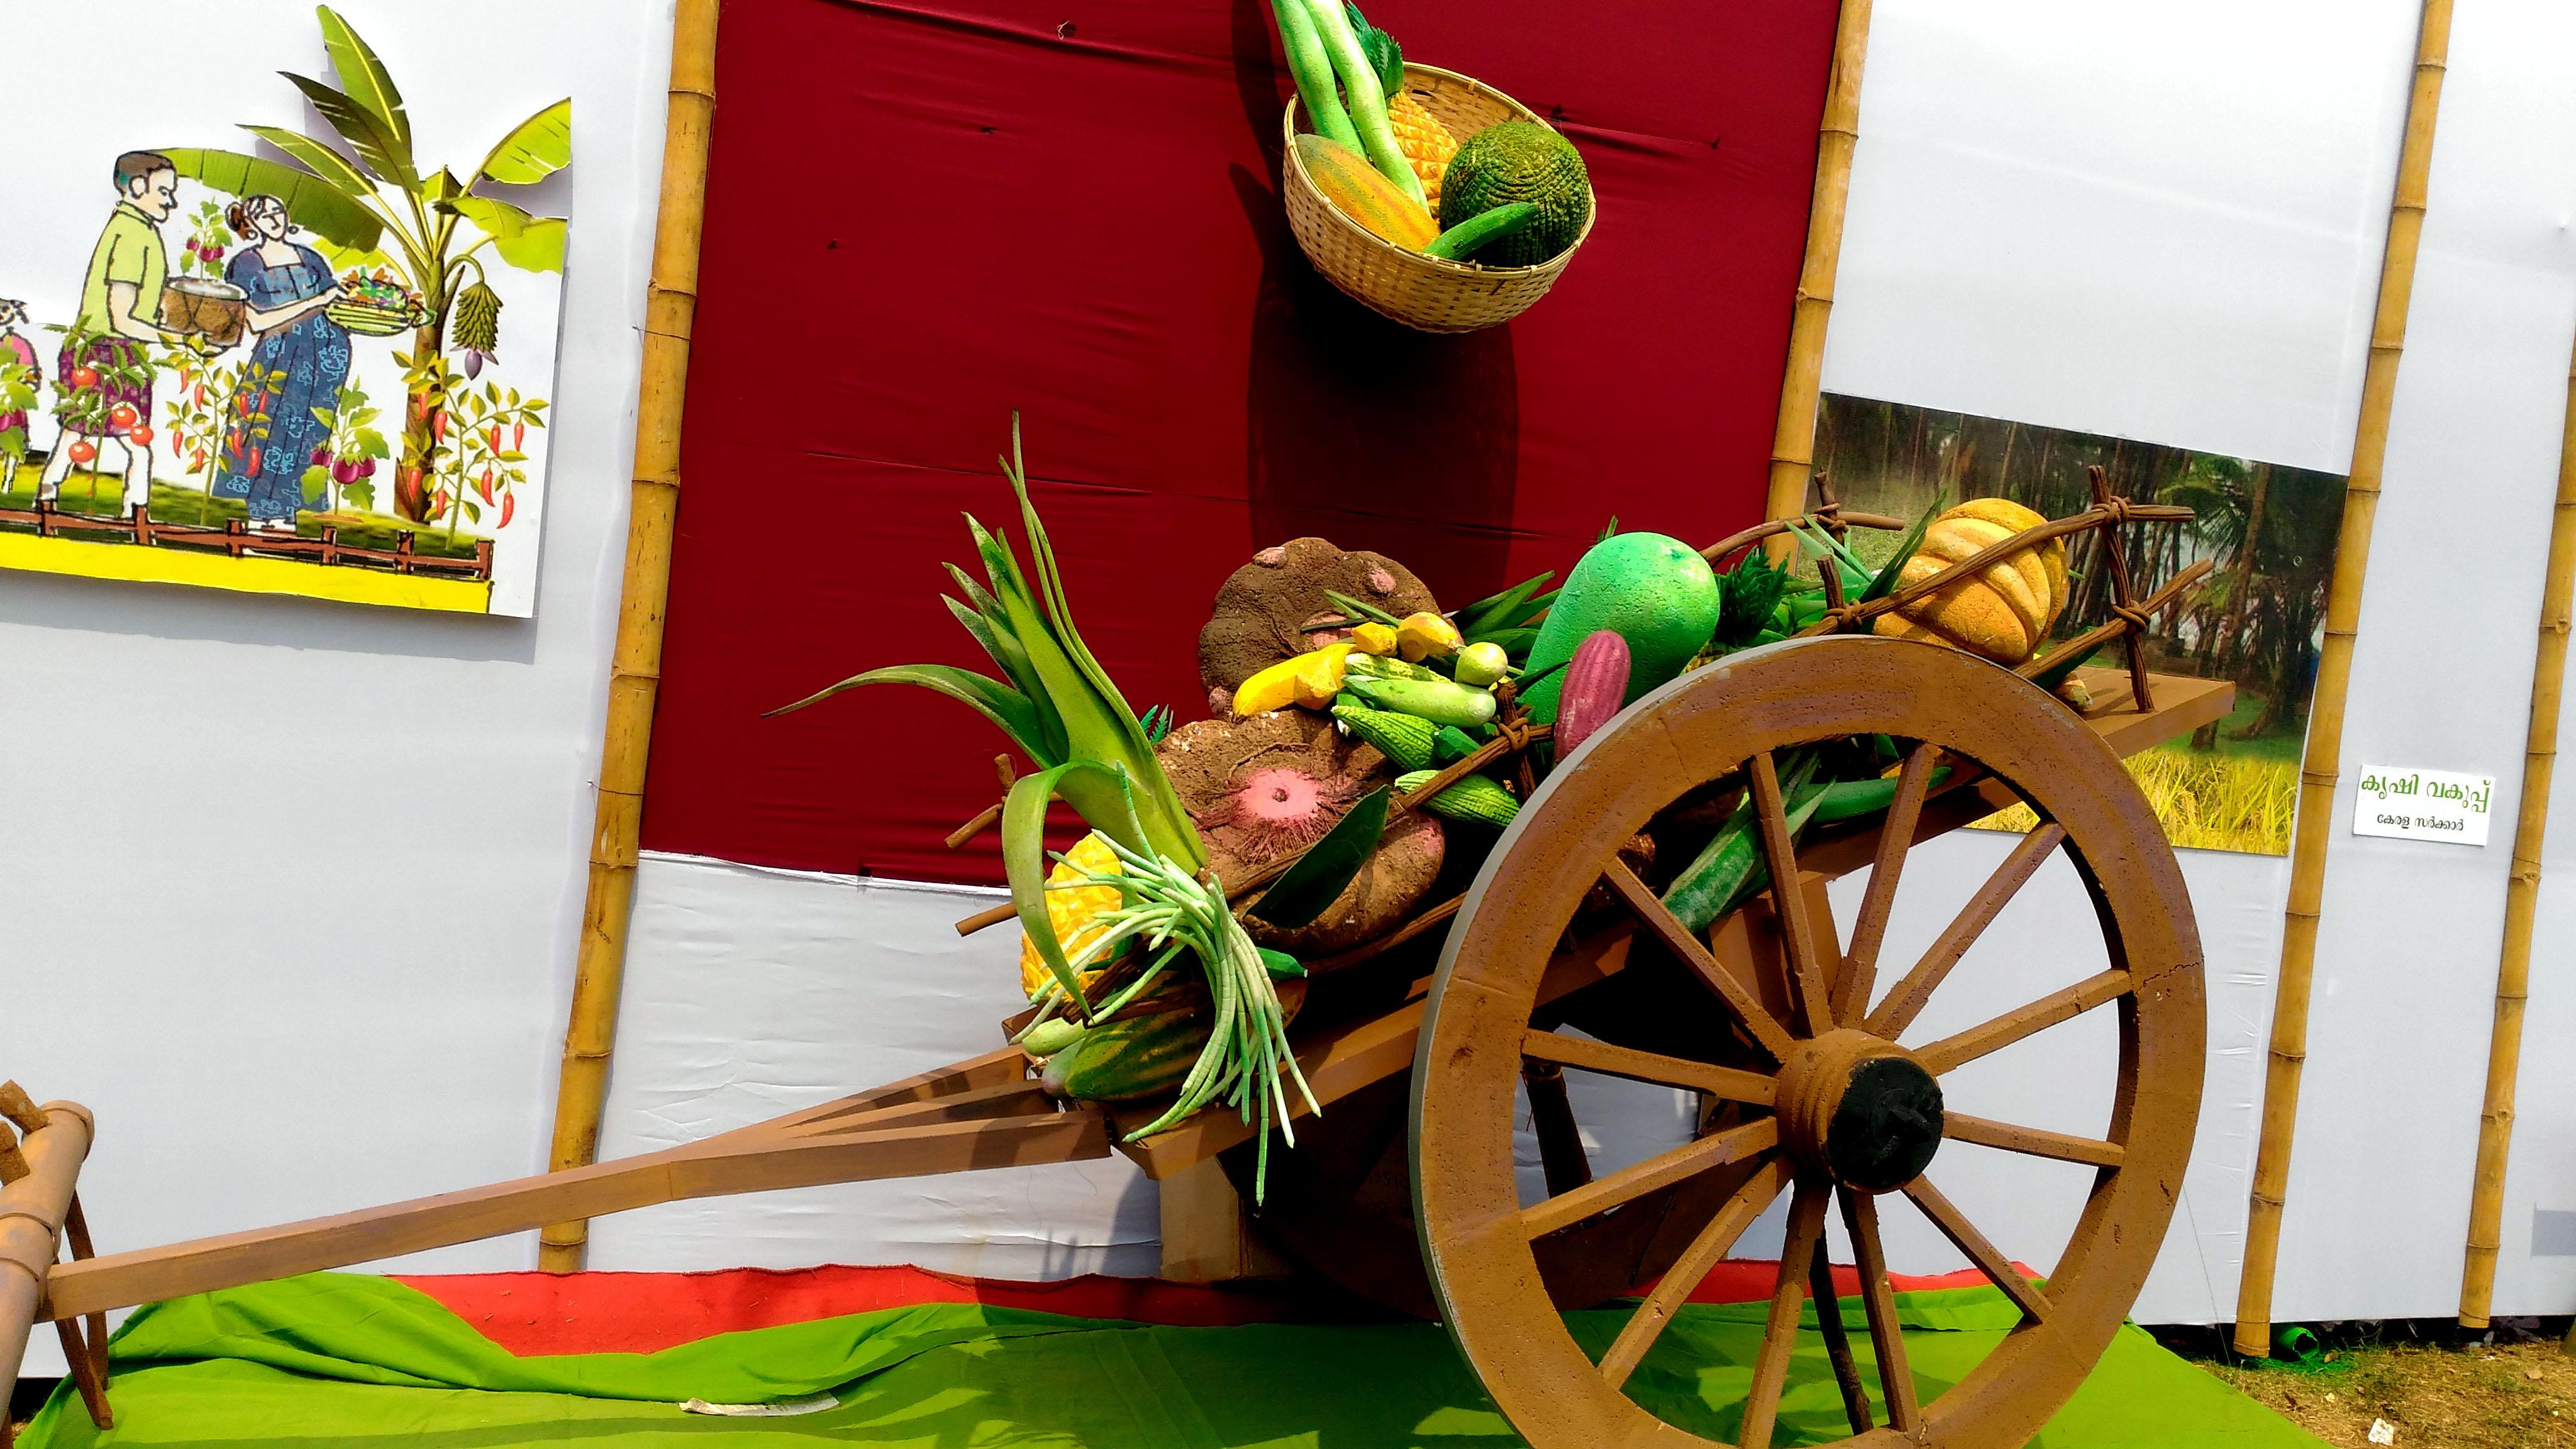 Kerala school kalolsavam 2018 Thrissur main stage farm information bureau kerala stall image